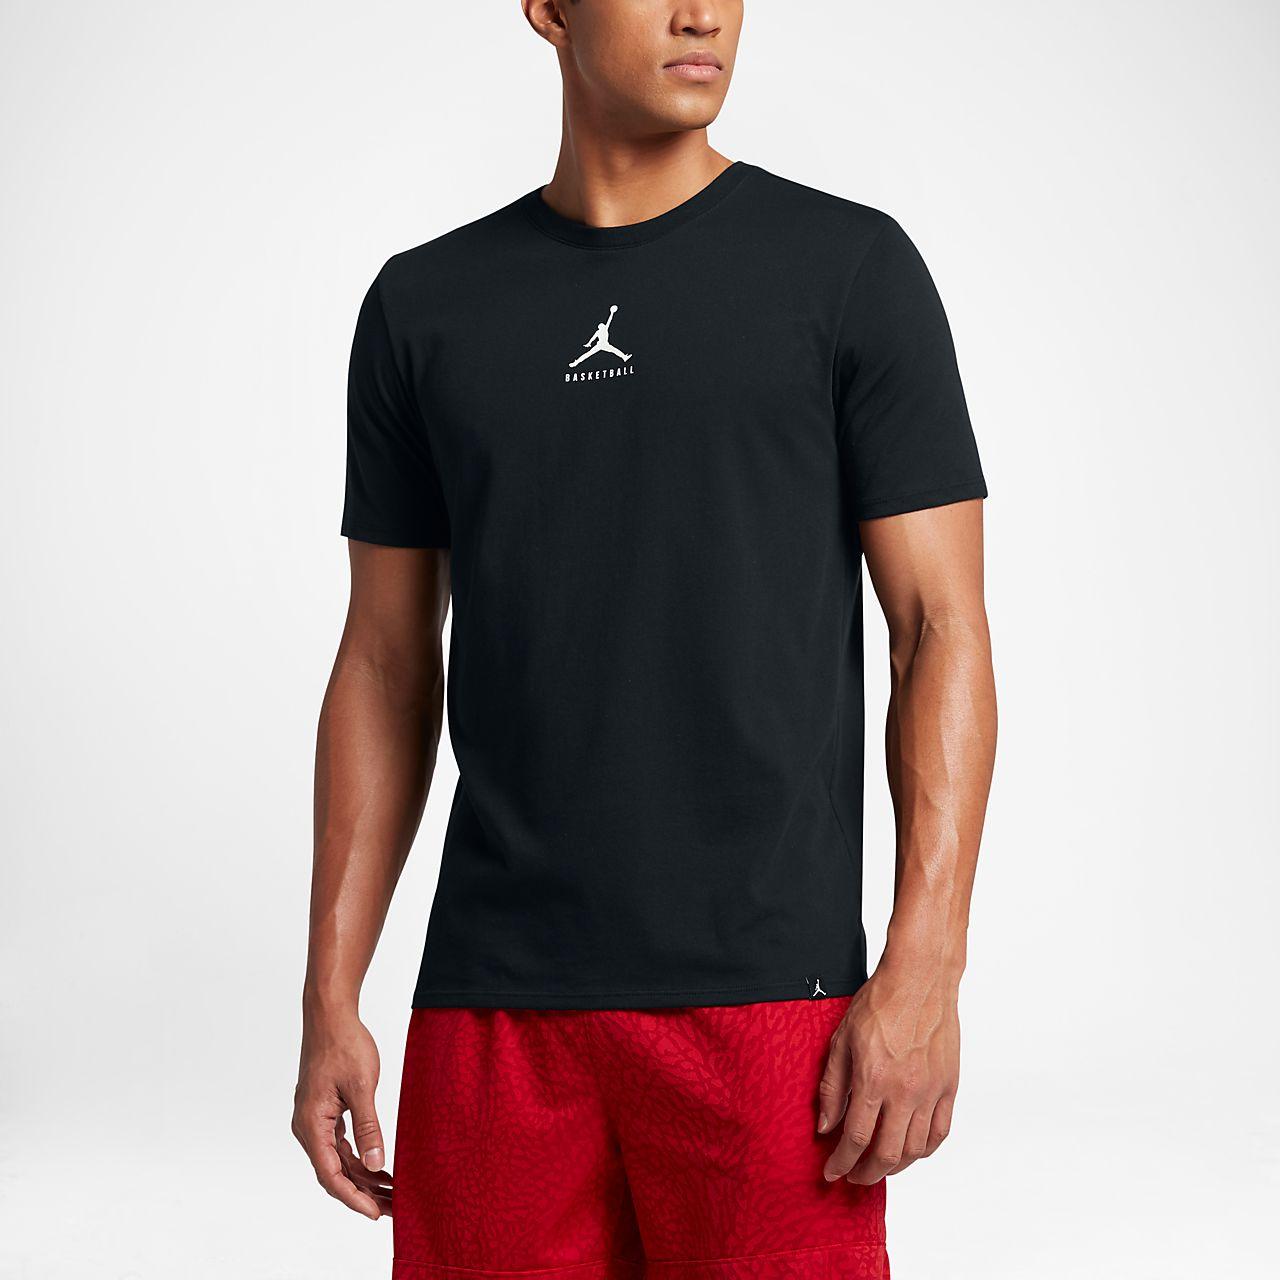 Jordan Dry 23/7 Jumpman Basketball Men's T-Shirts Black/White